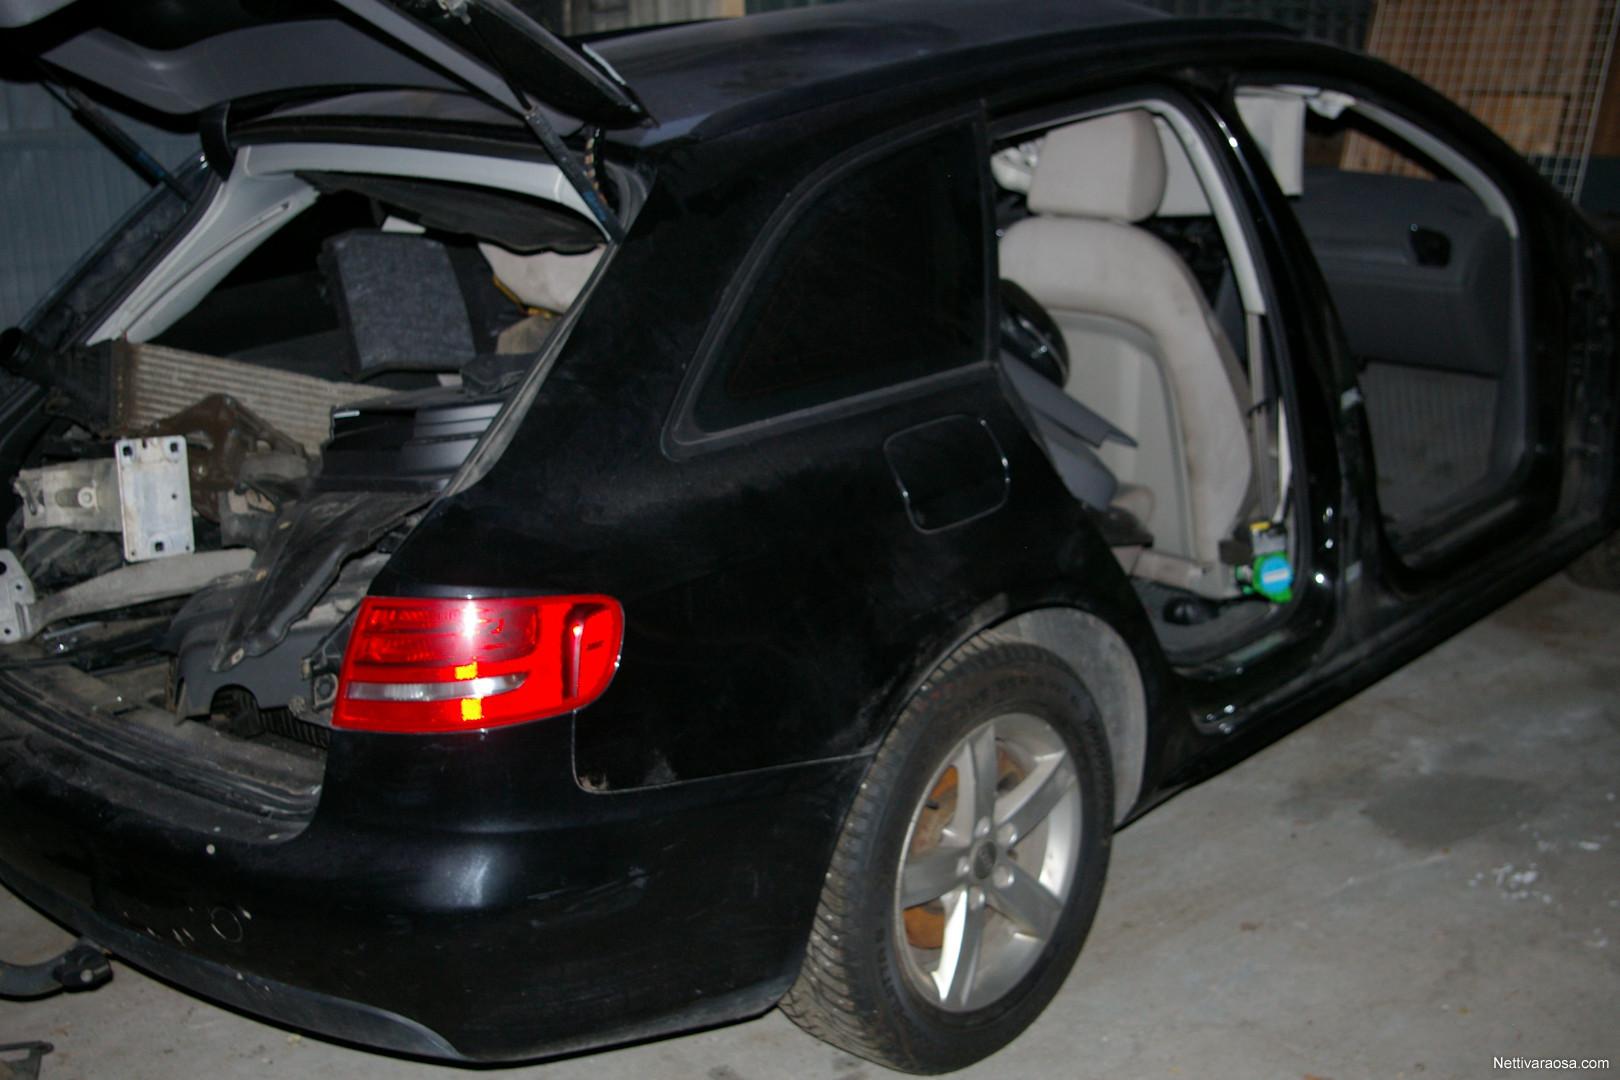 Audi A4 B8 A4 Avant 2010 Car Spare Parts Nettivaraosa